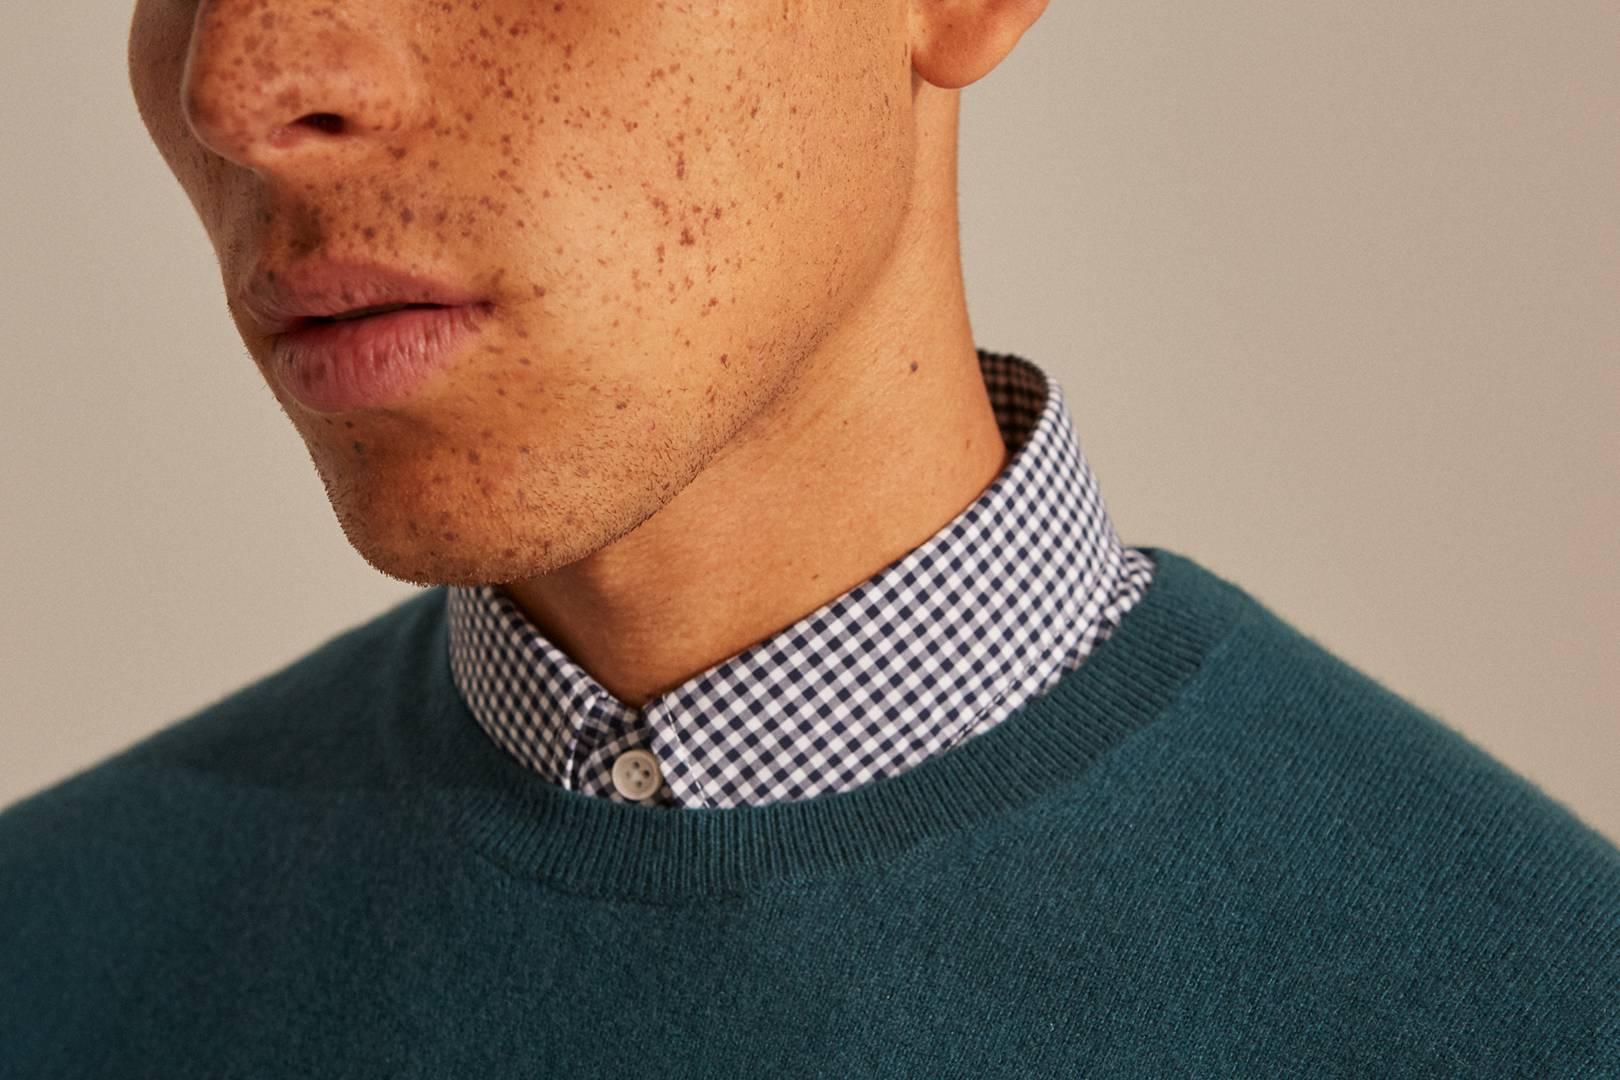 a15d731b81817a The new Autumn/Winter knitwear rules | British GQ